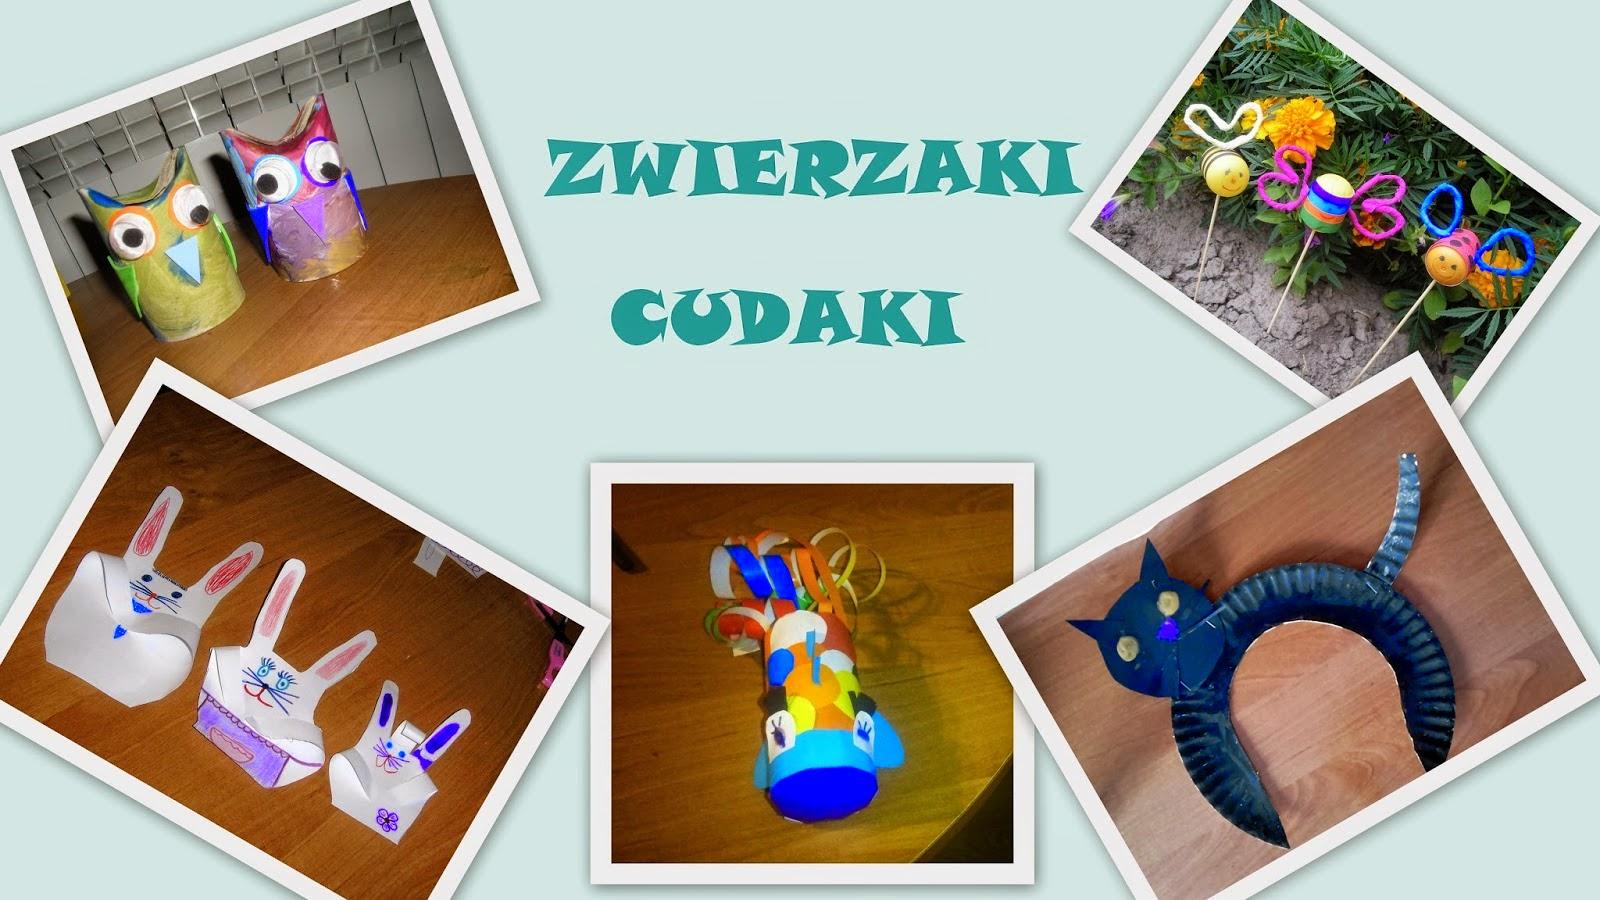 http://pomieszane-z-poplatanym.blogspot.com/p/nasze-zabawy-i-projekty_12.html